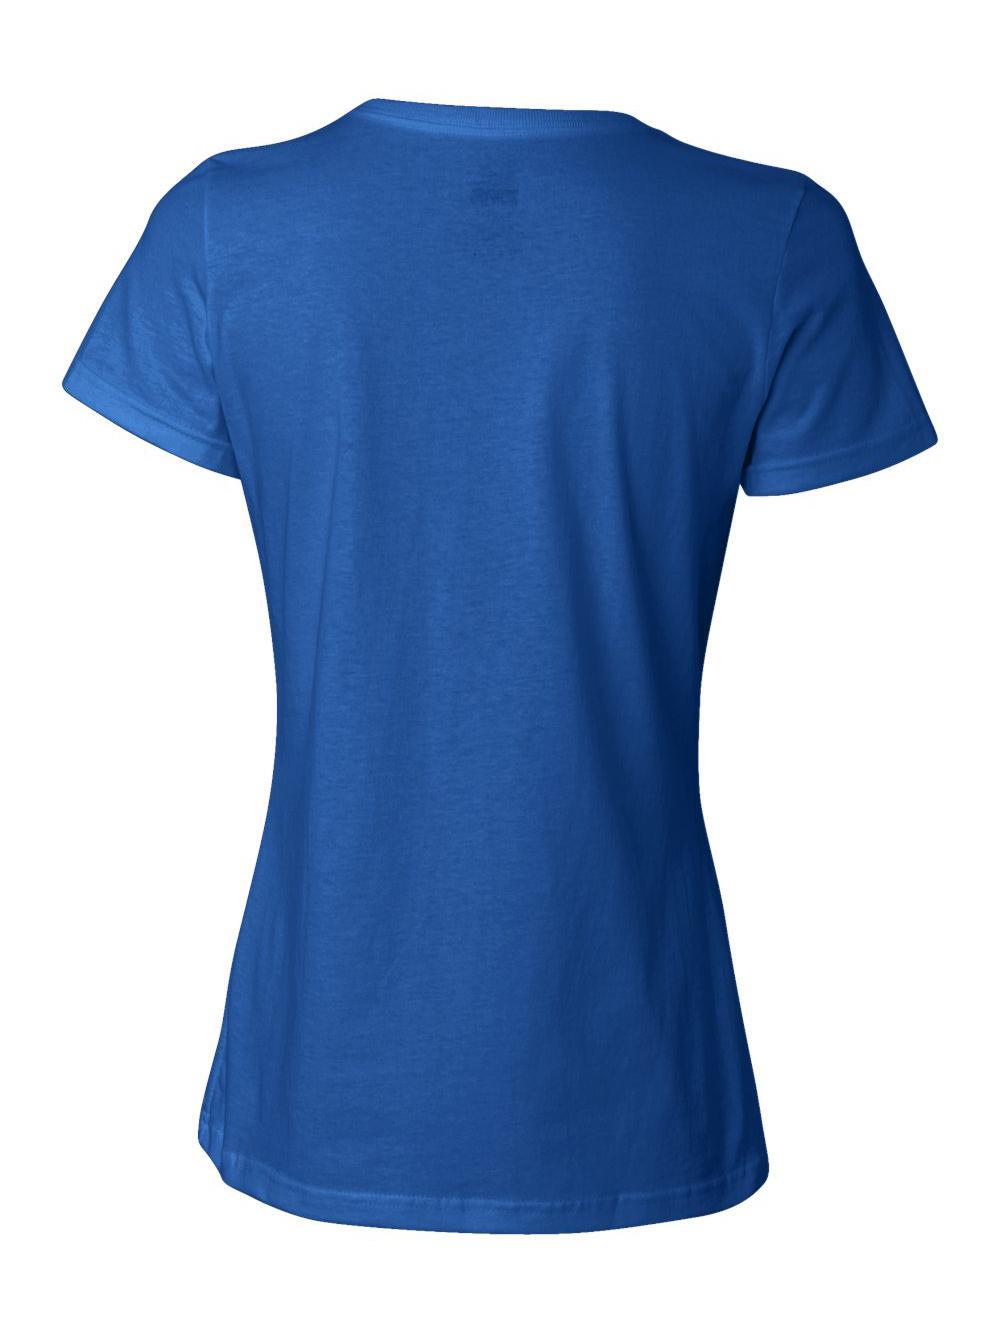 Fruit-of-the-Loom-HD-Cotton-Women-039-s-Short-Sleeve-T-Shirt-L3930R thumbnail 34